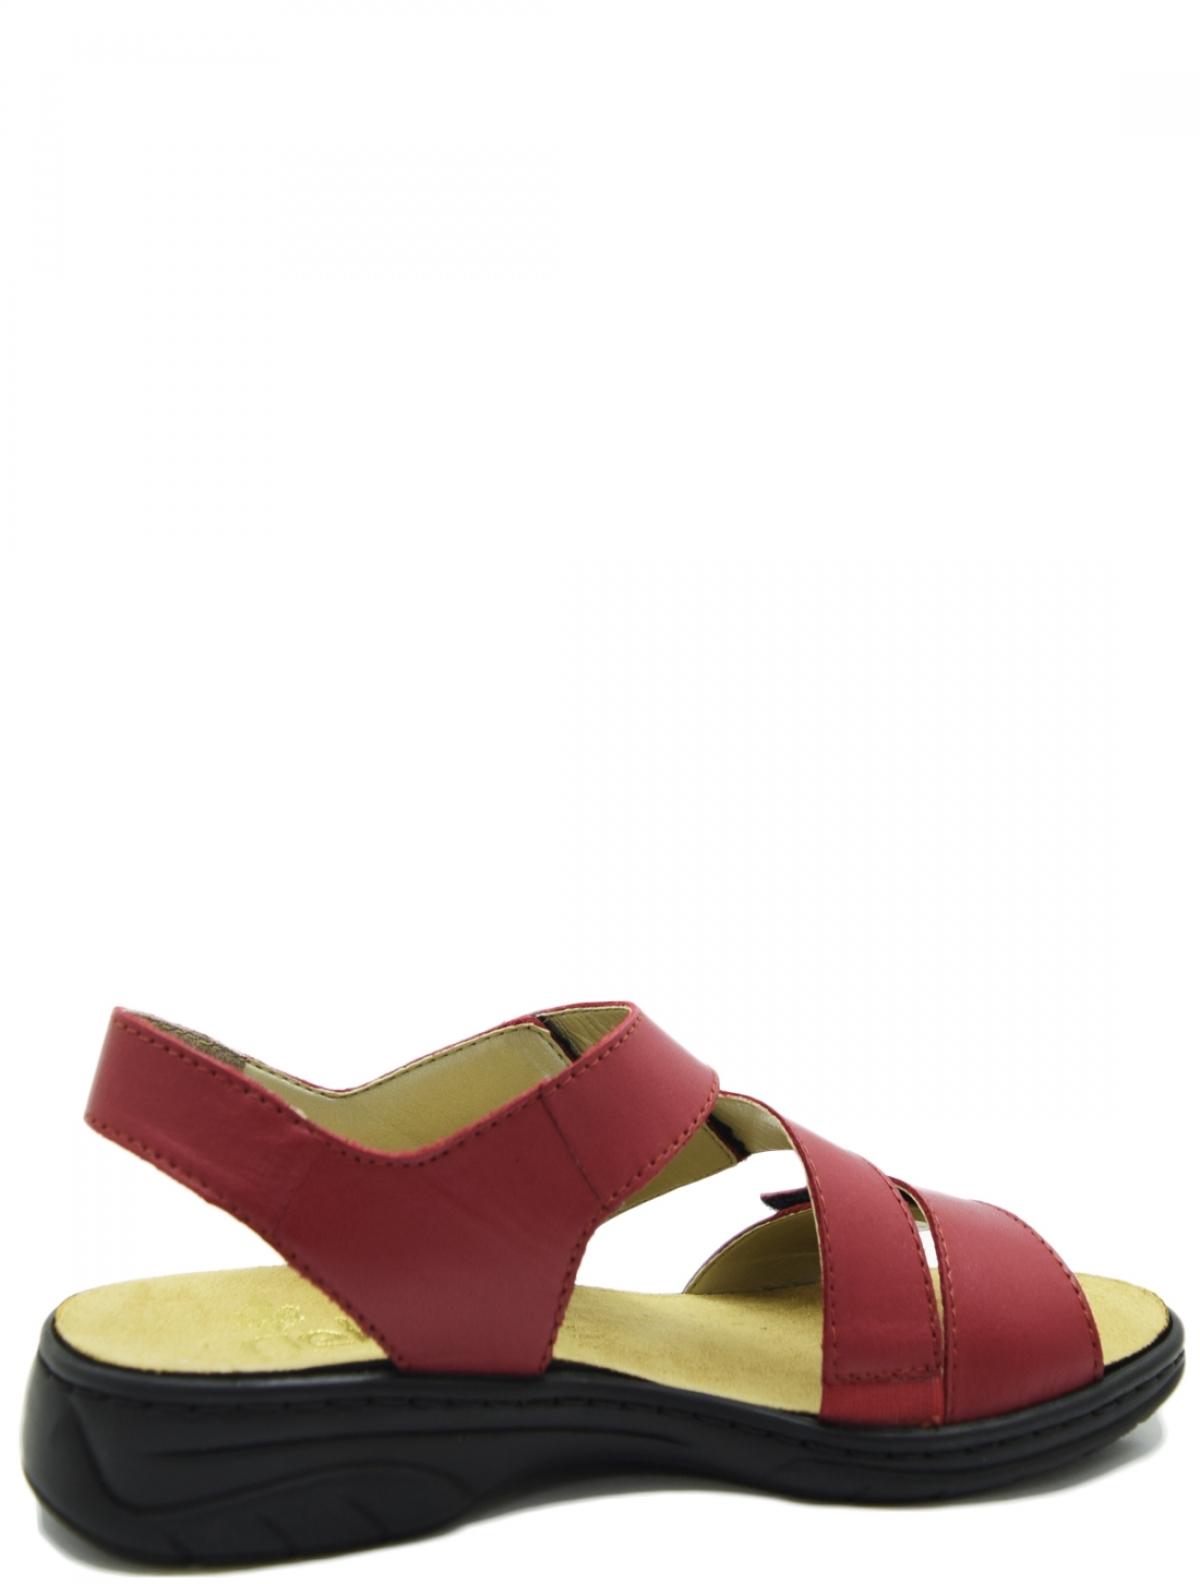 Rieker 64573-33 женские сандали